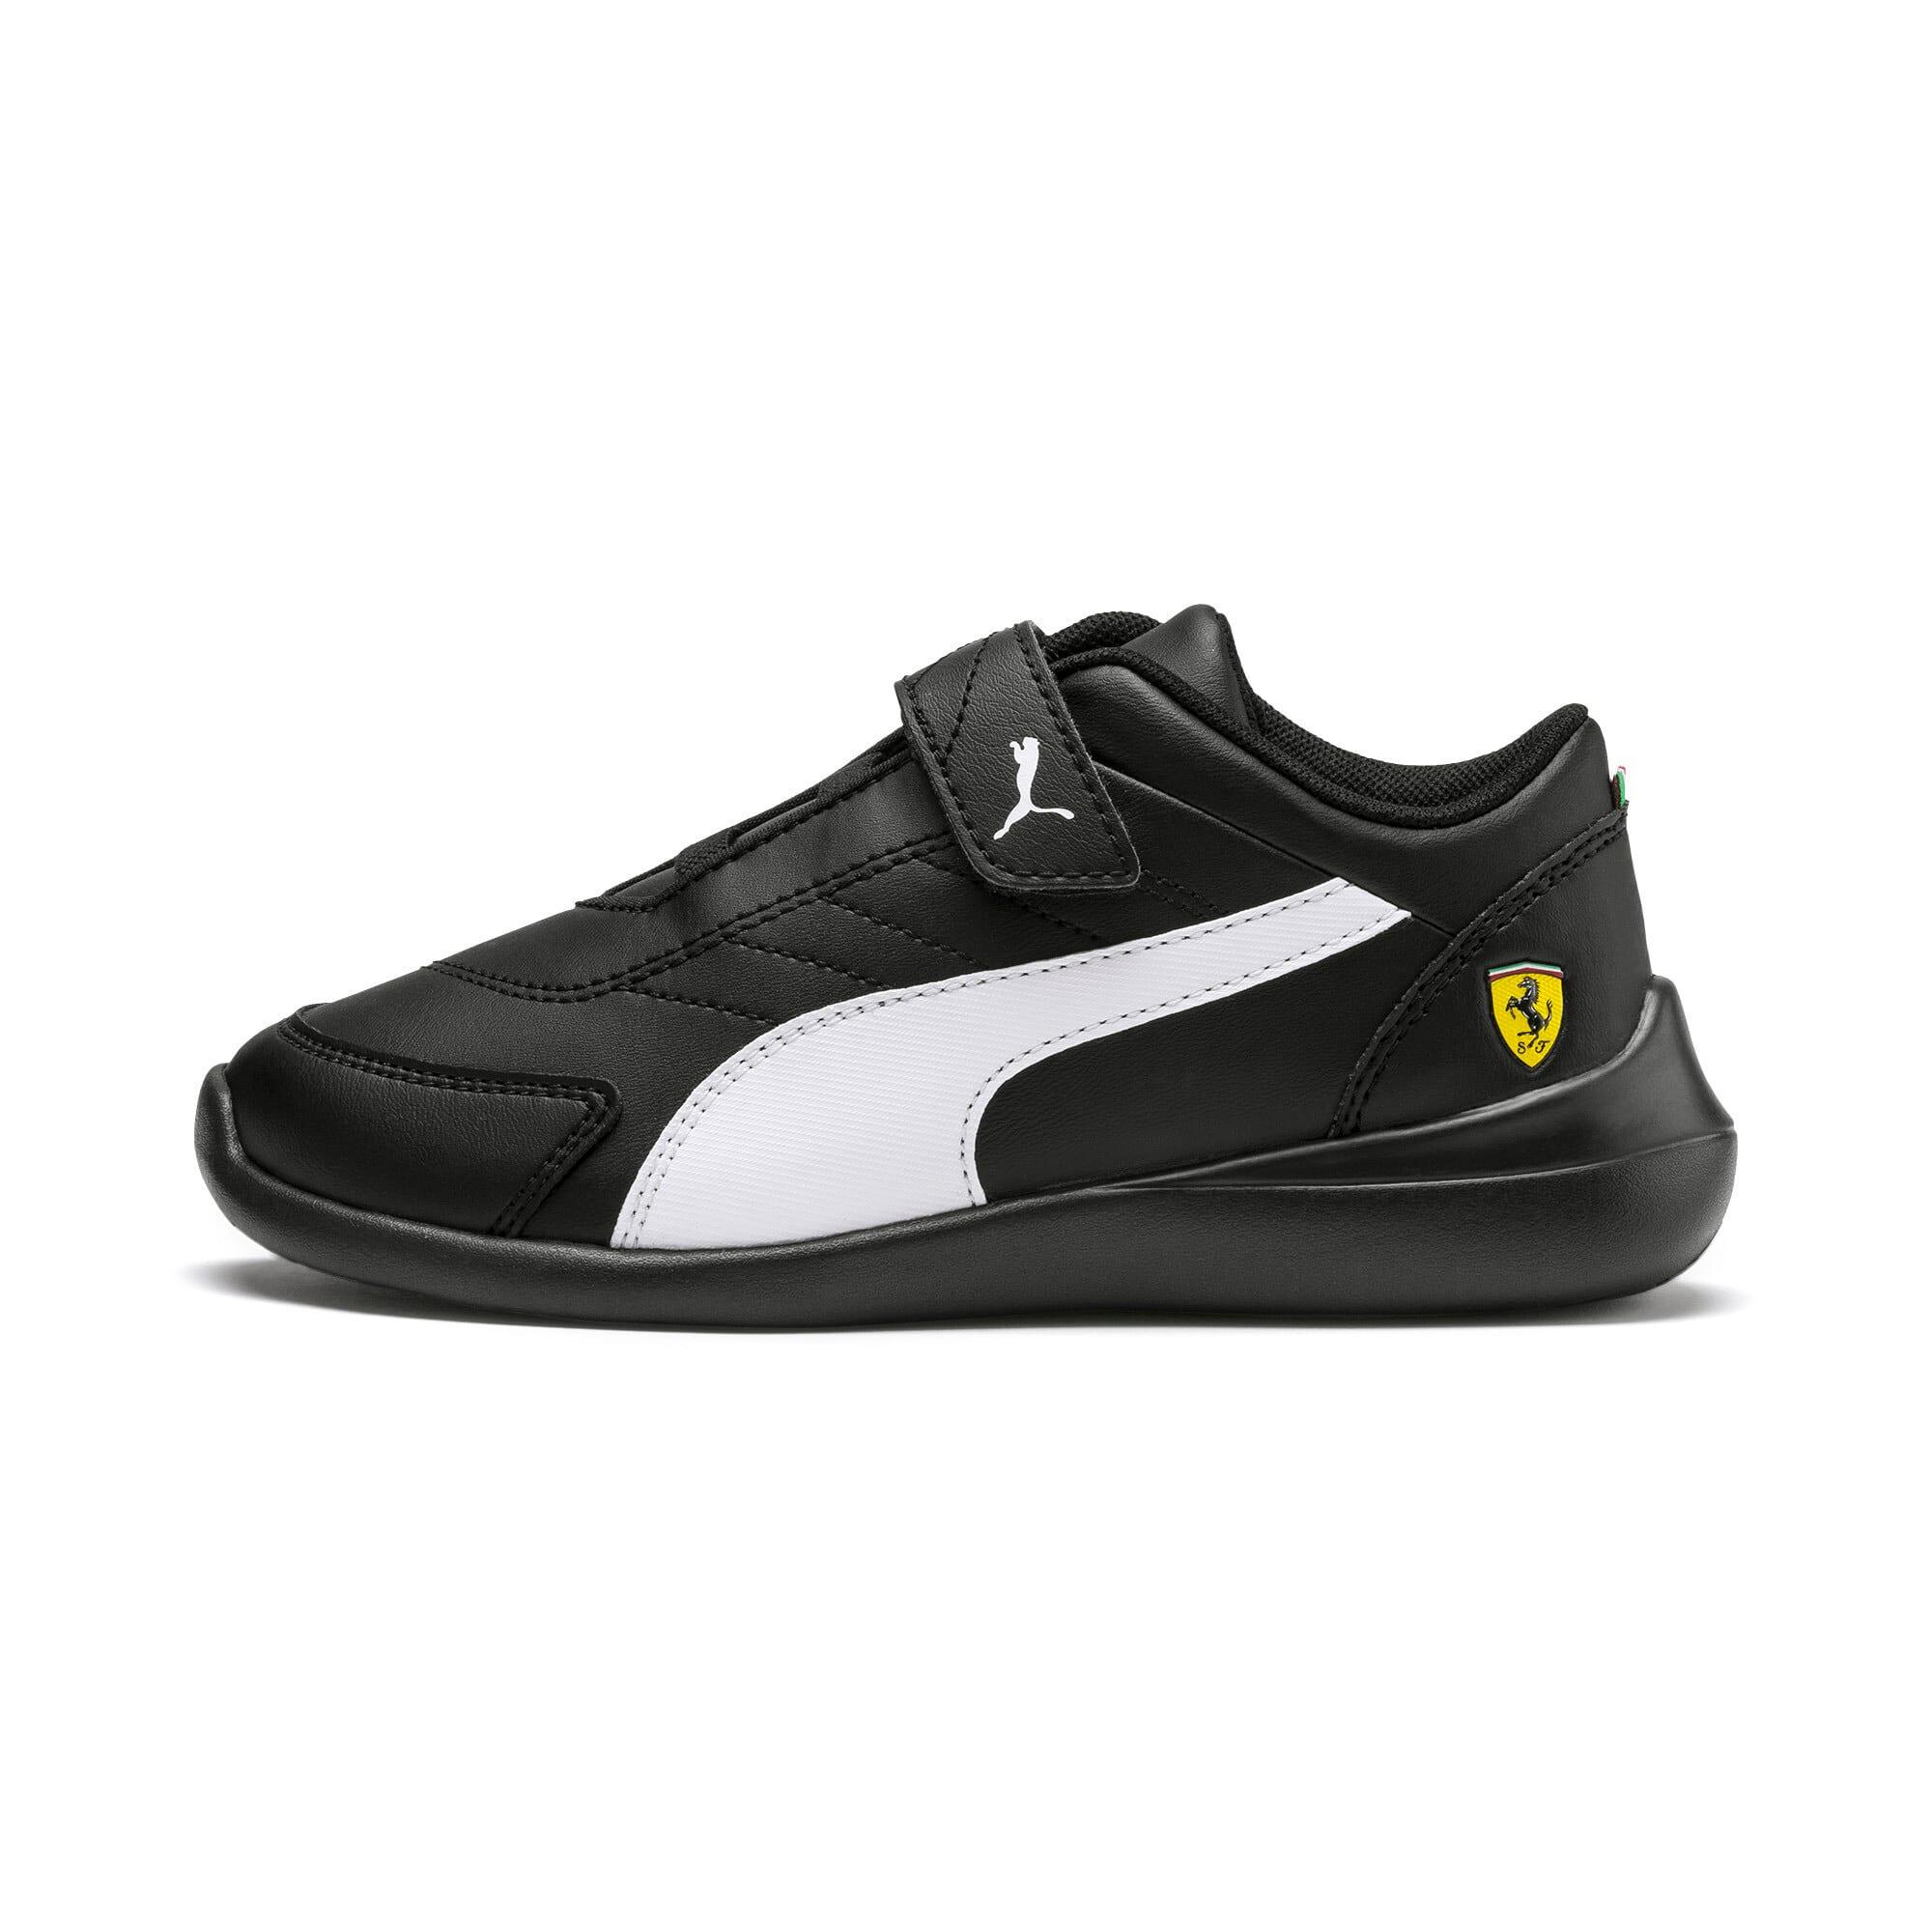 Thumbnail 1 of Ferrari Kart Cat III Kids Sneaker, Black-White-Blazing Yellow, medium